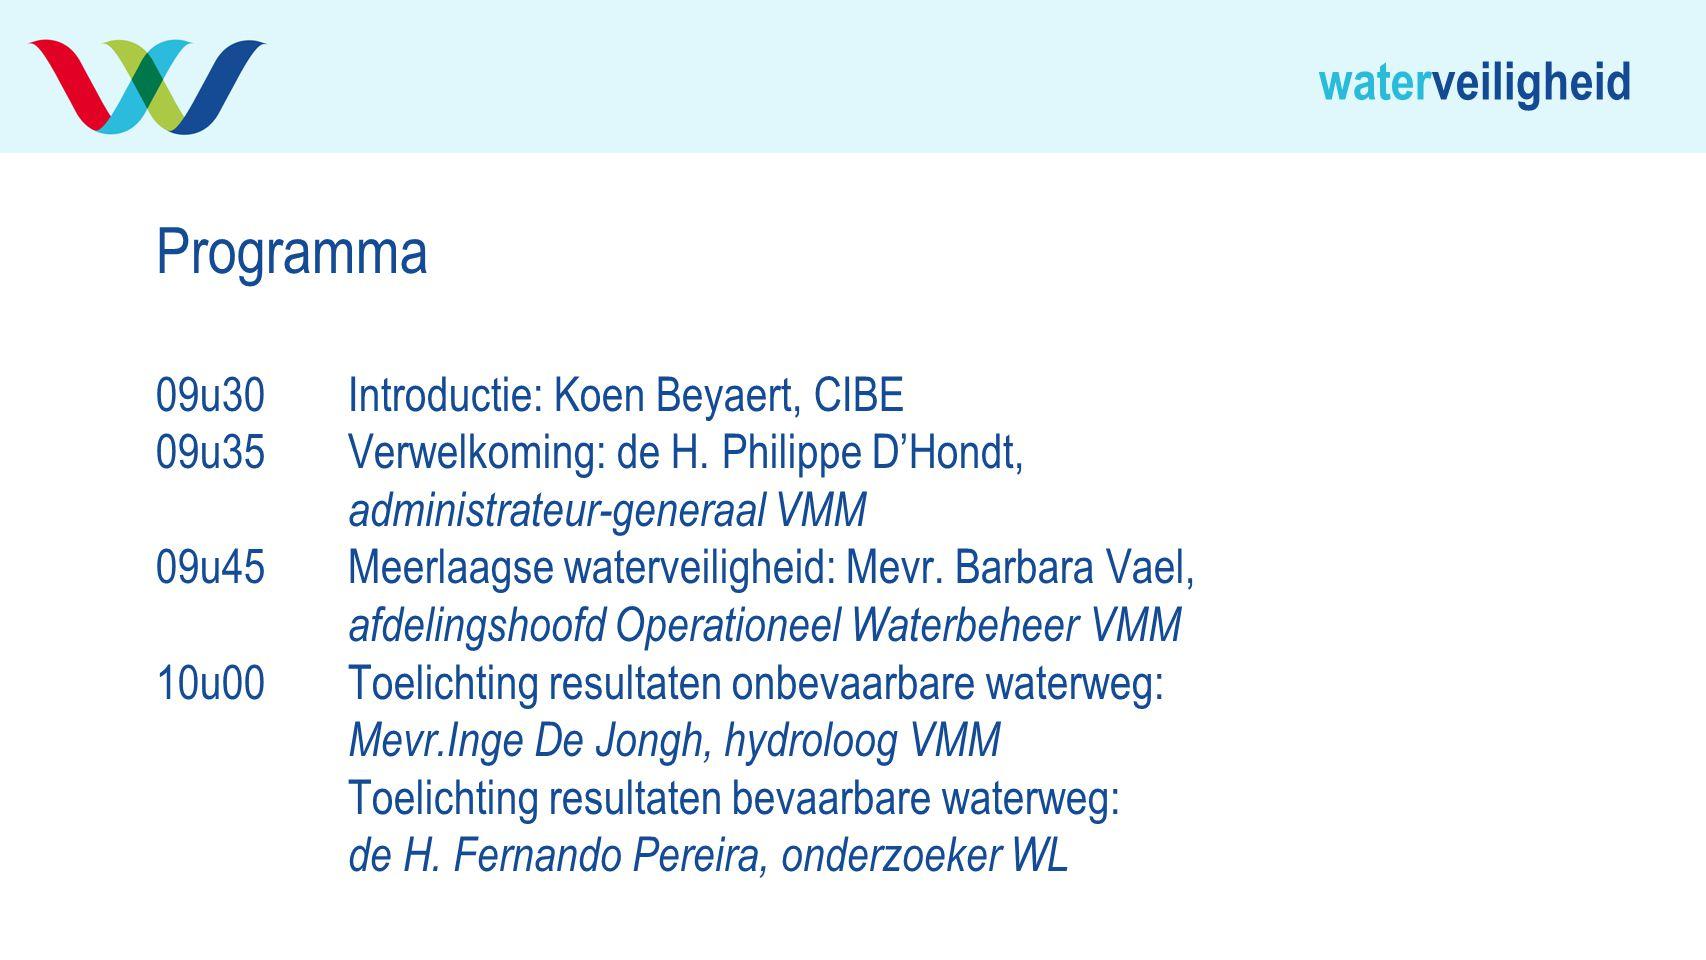 waterveiligheid Programma 09u30Introductie: Koen Beyaert, CIBE 09u35Verwelkoming: de H. Philippe D'Hondt, administrateur-generaal VMM 09u45Meerlaagse